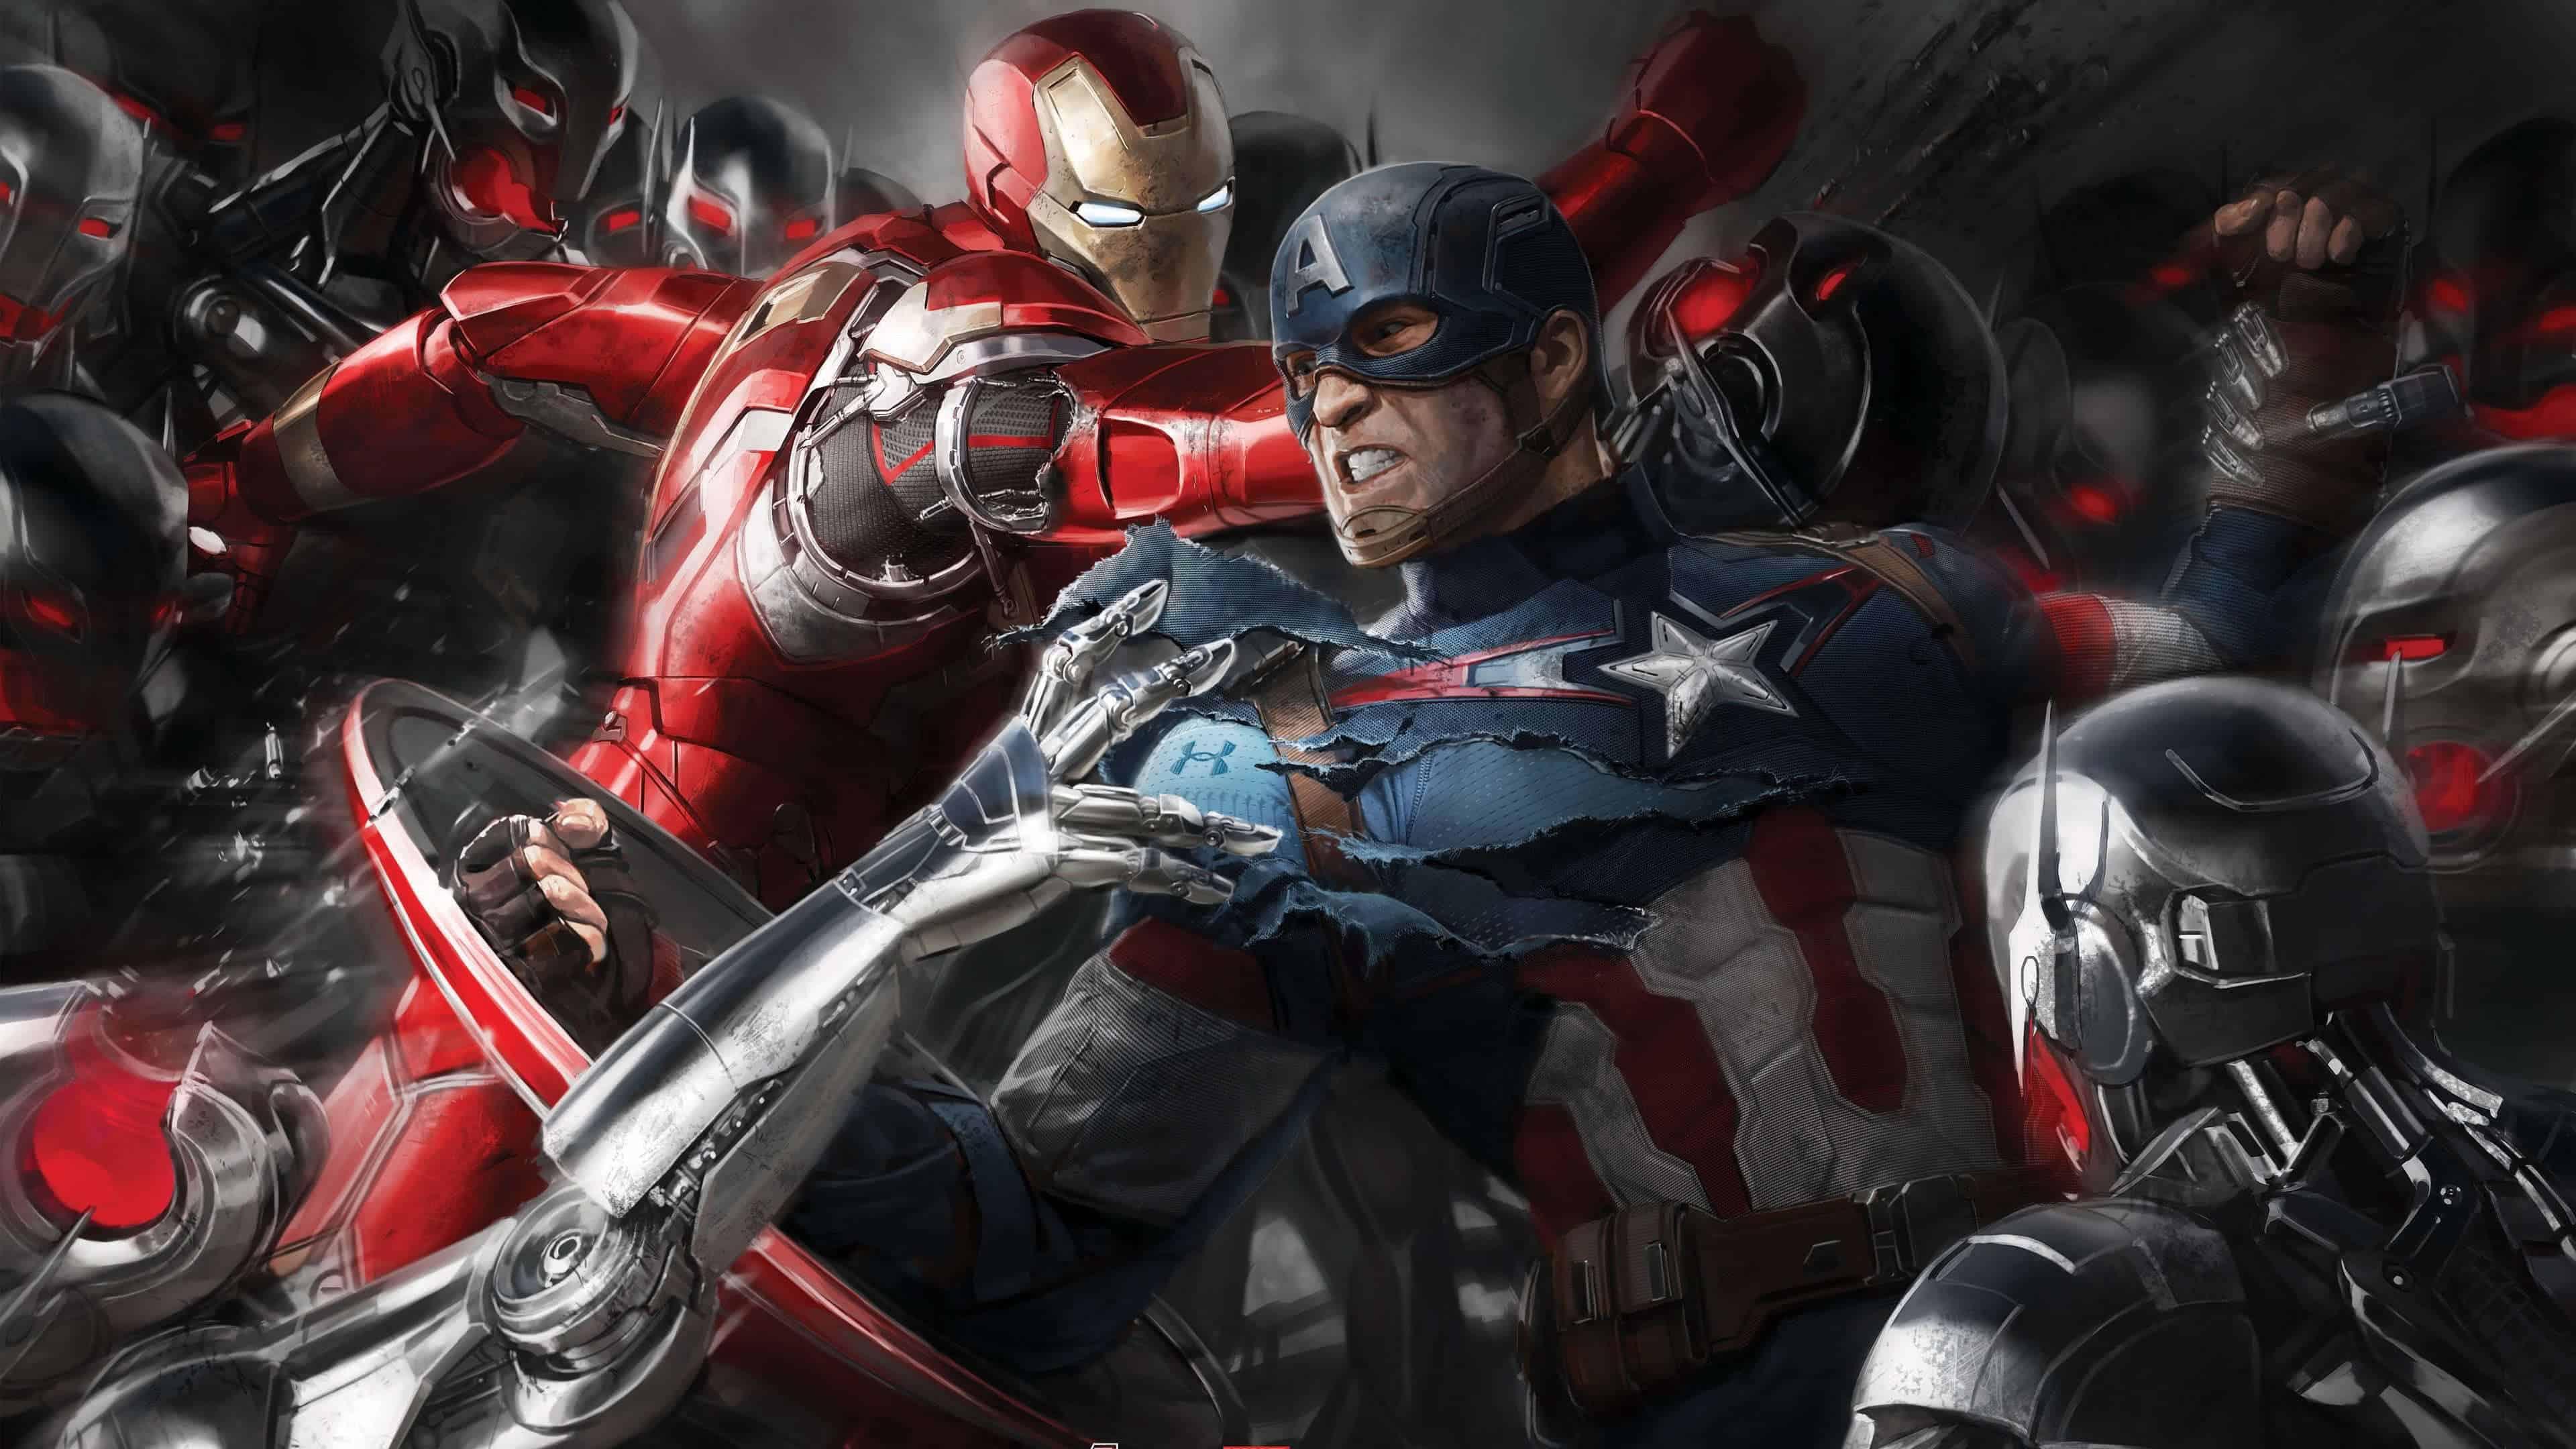 Iron Man Vs Captain America Wallpapers Top Free Iron Man Vs